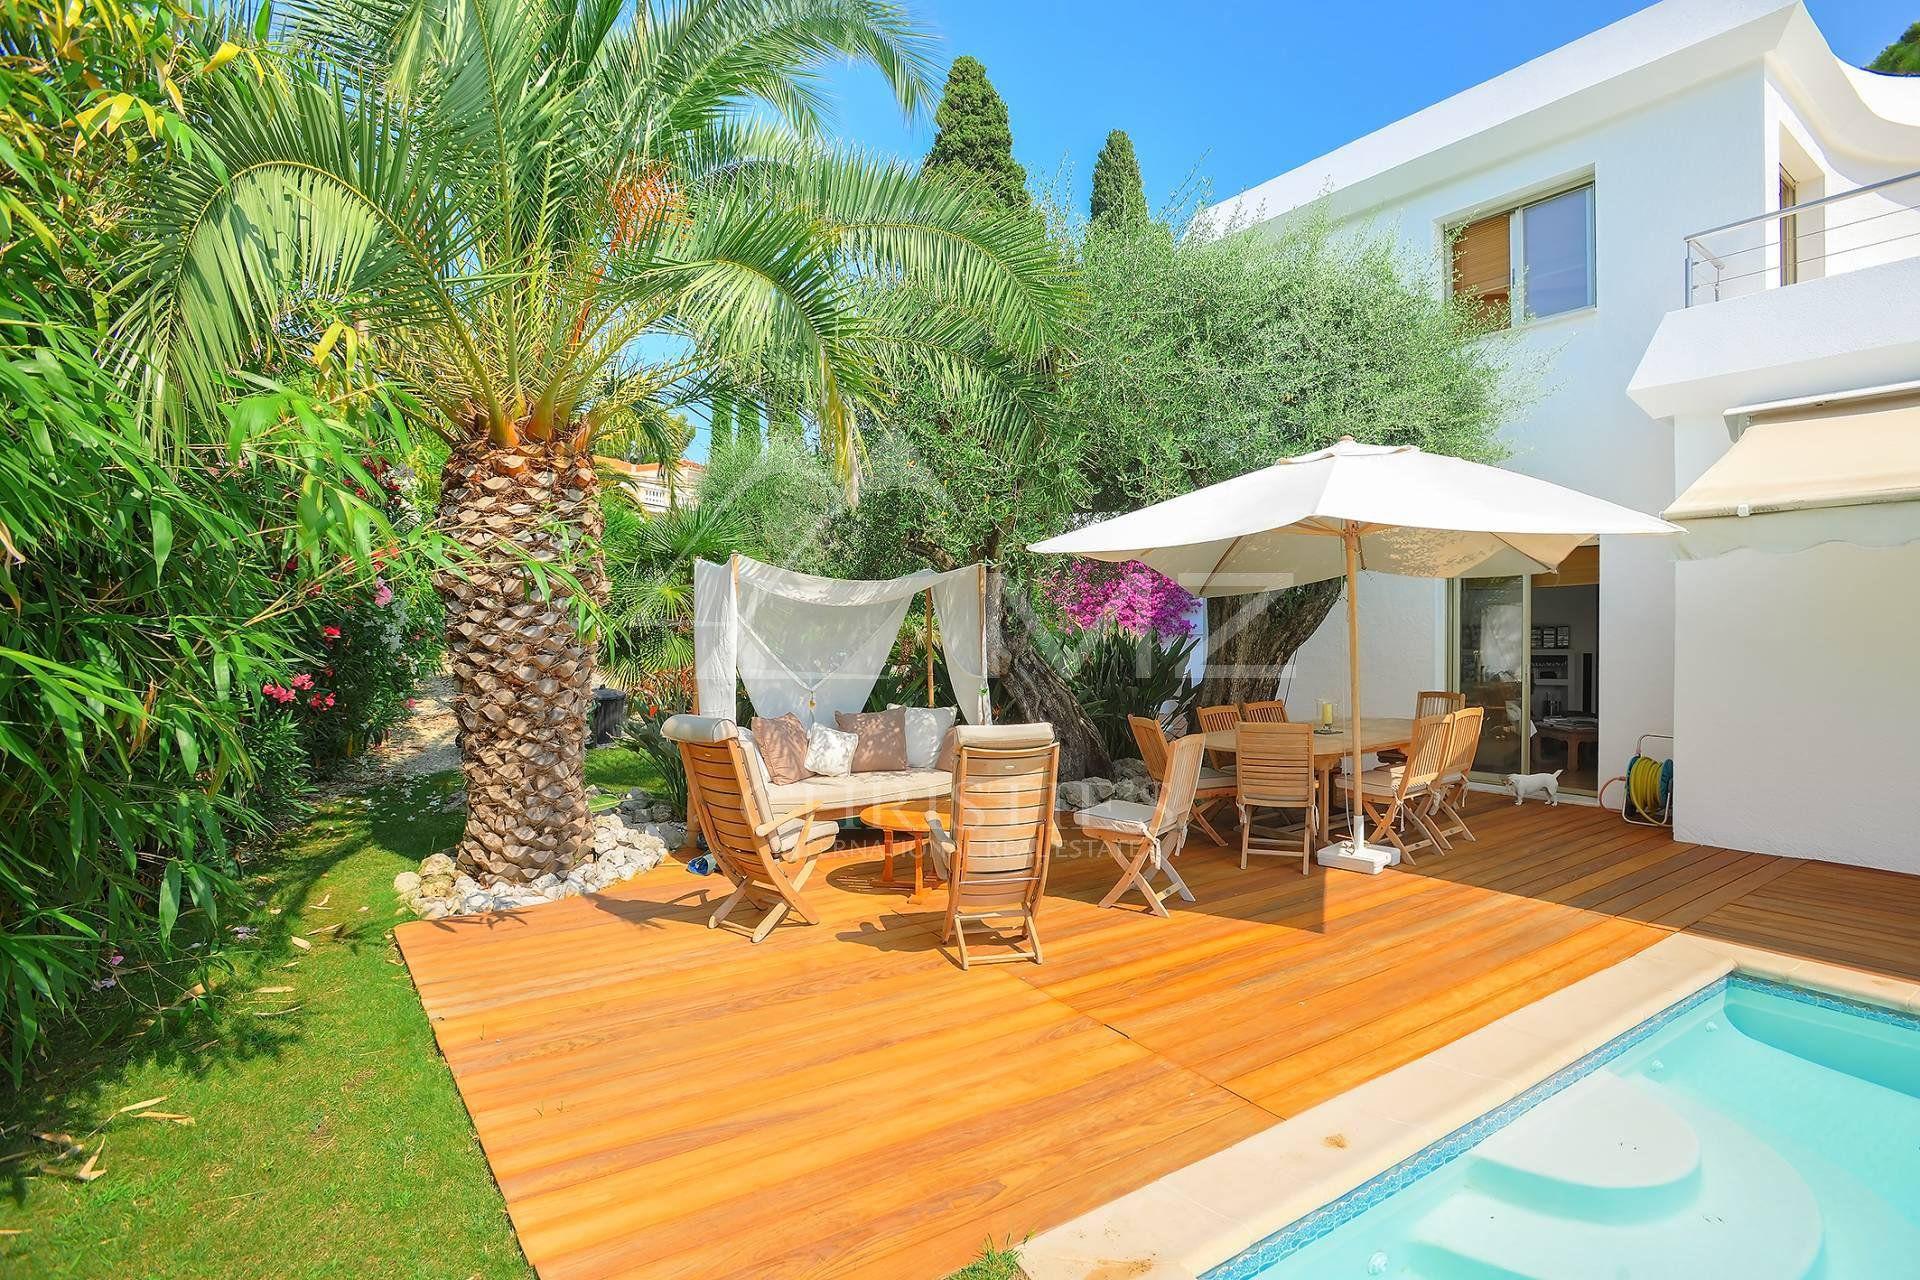 Cannes - Basse Californie - Gated domain